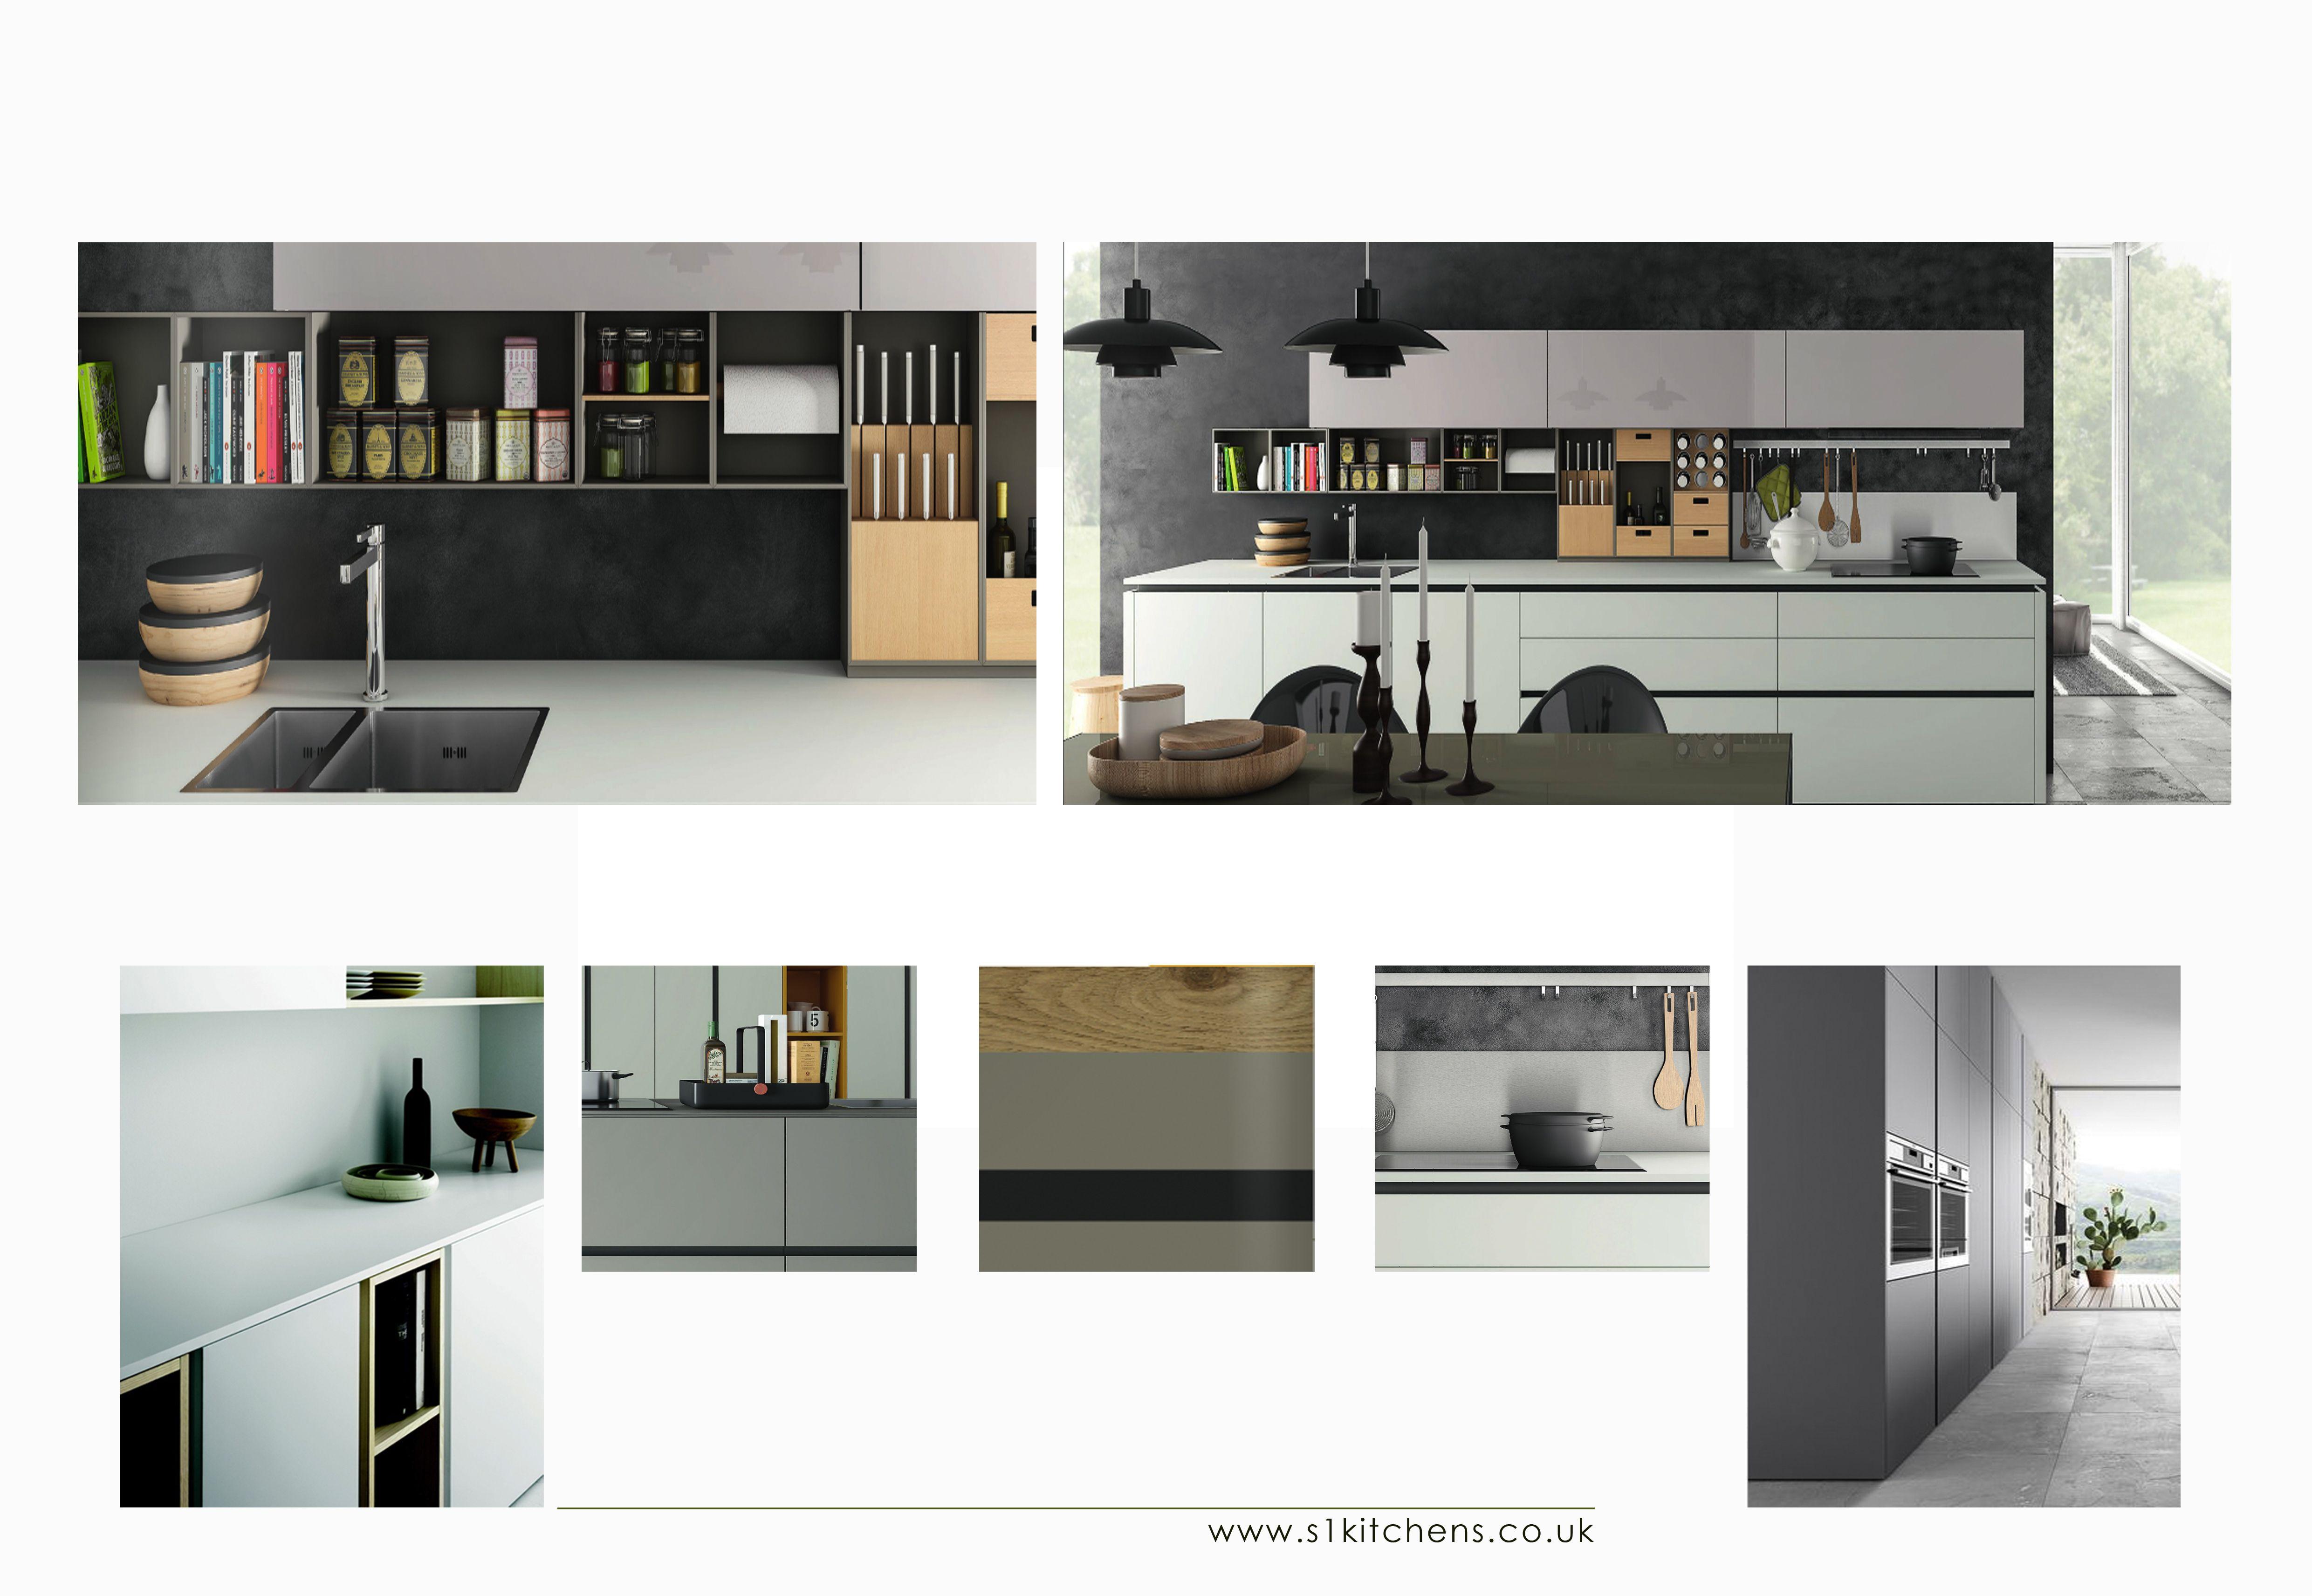 Mesonu0027s Cucine, Italian Kitchens Available From S1 Kitchens Hampshire UK  M 22 Range